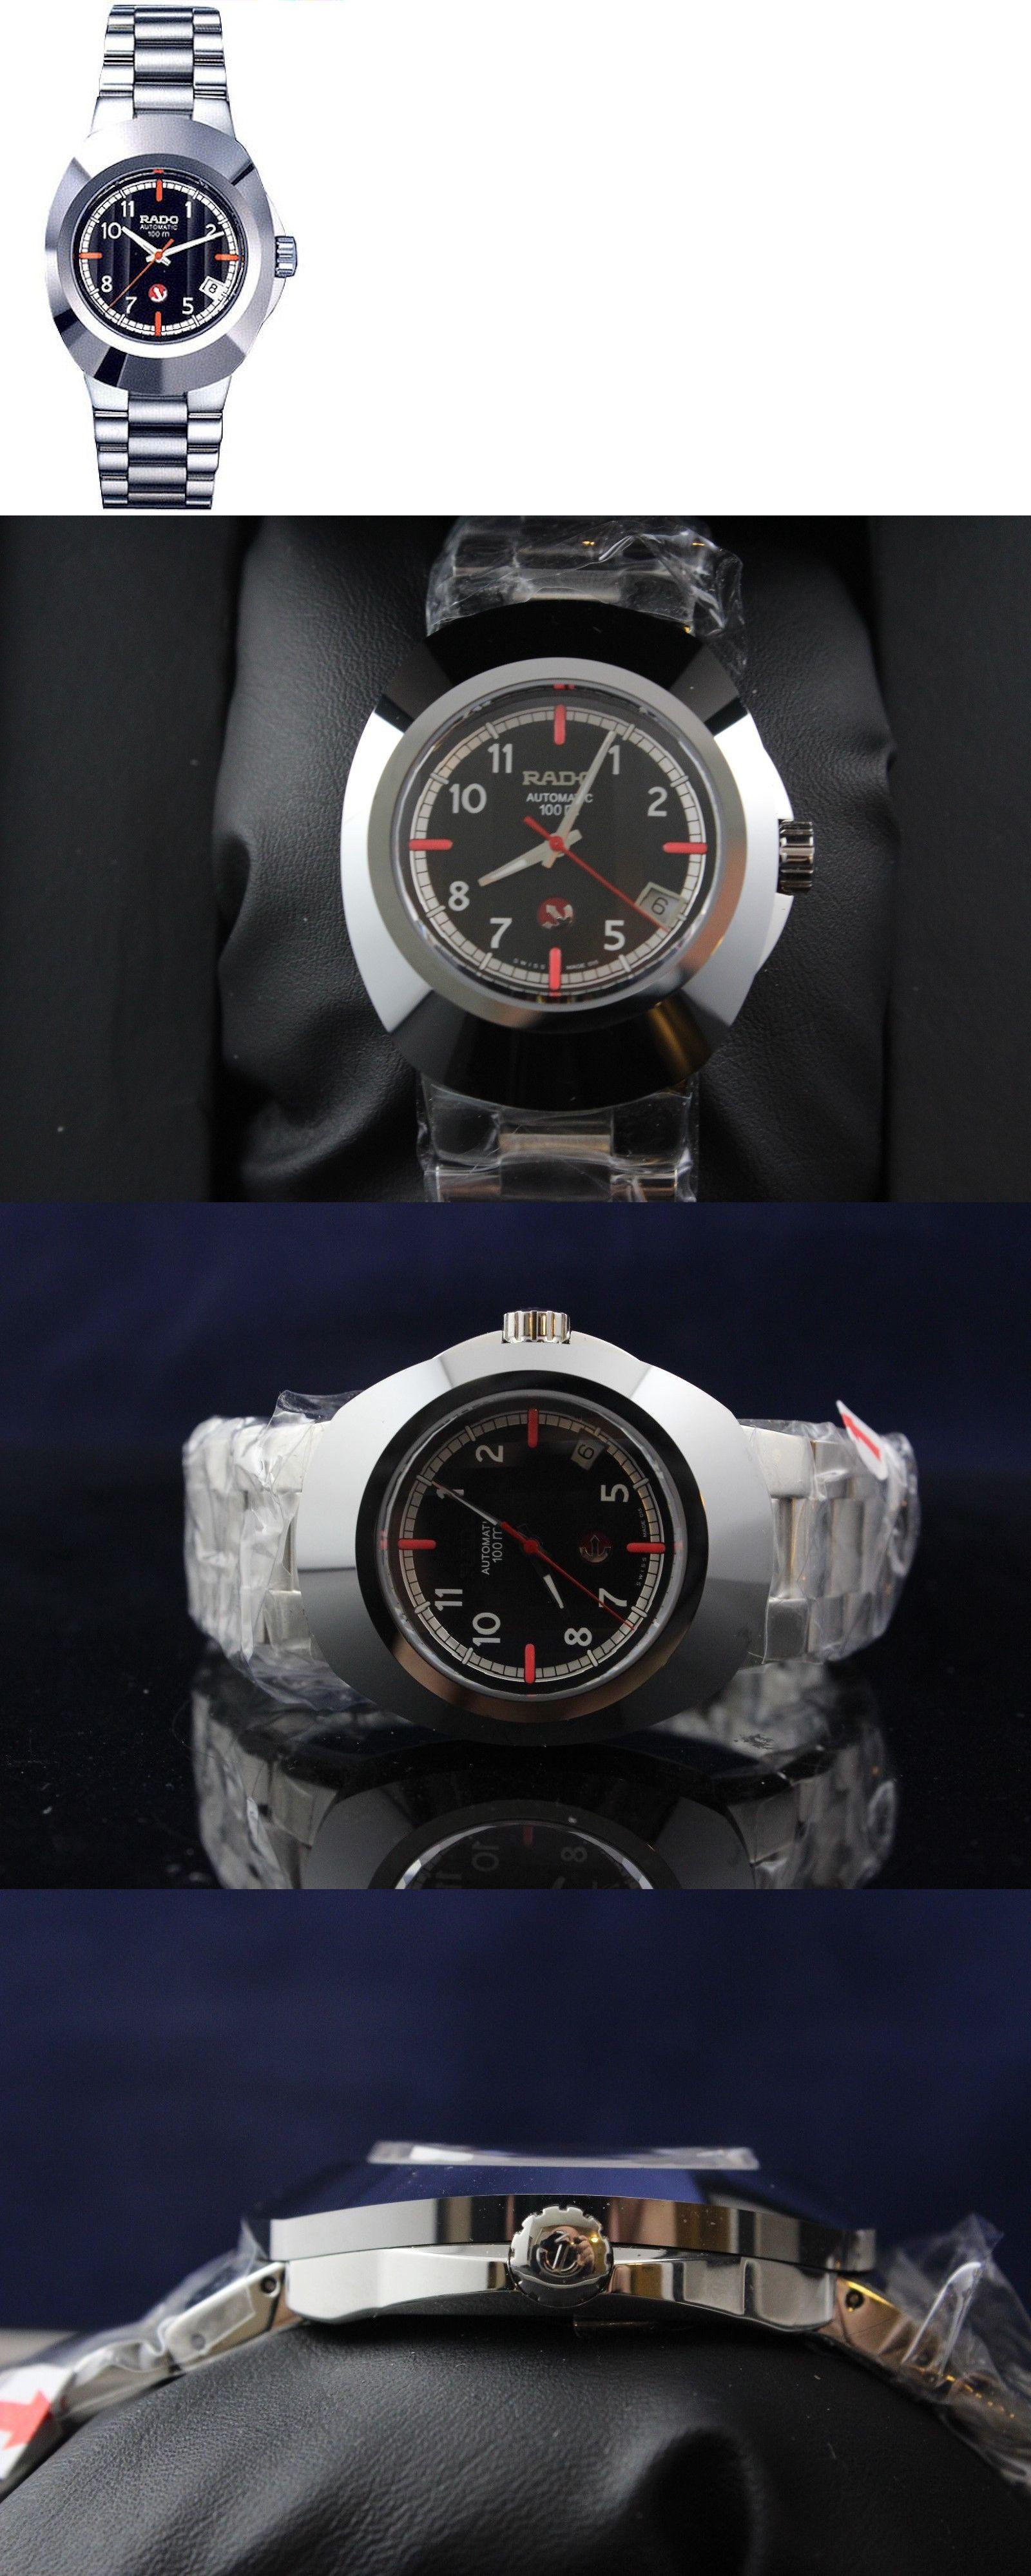 bb7b30decf94 Wristwatches 31387  New Rado Original Mens Automatic Stainless Steel  Bracelet Watch R12637153 BUY IT NOW ONLY   499.0